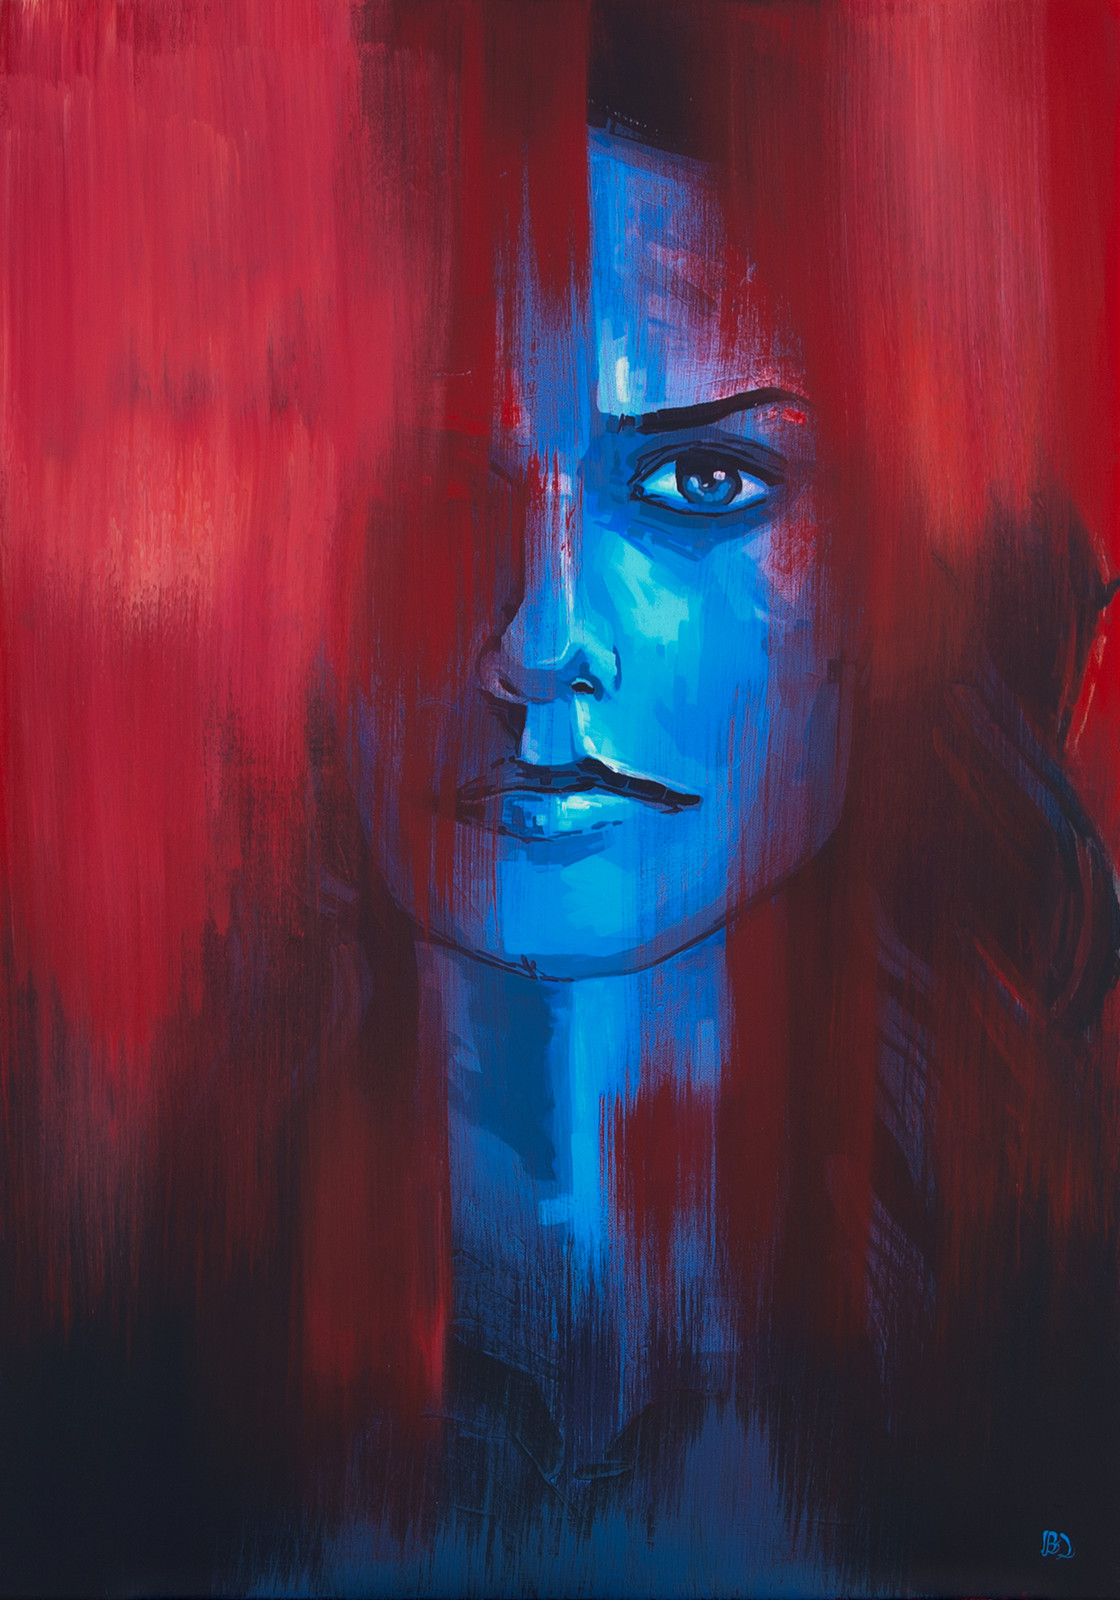 Daydream, Eyes Were Young Acrylic on canvas (70 x 100cm)